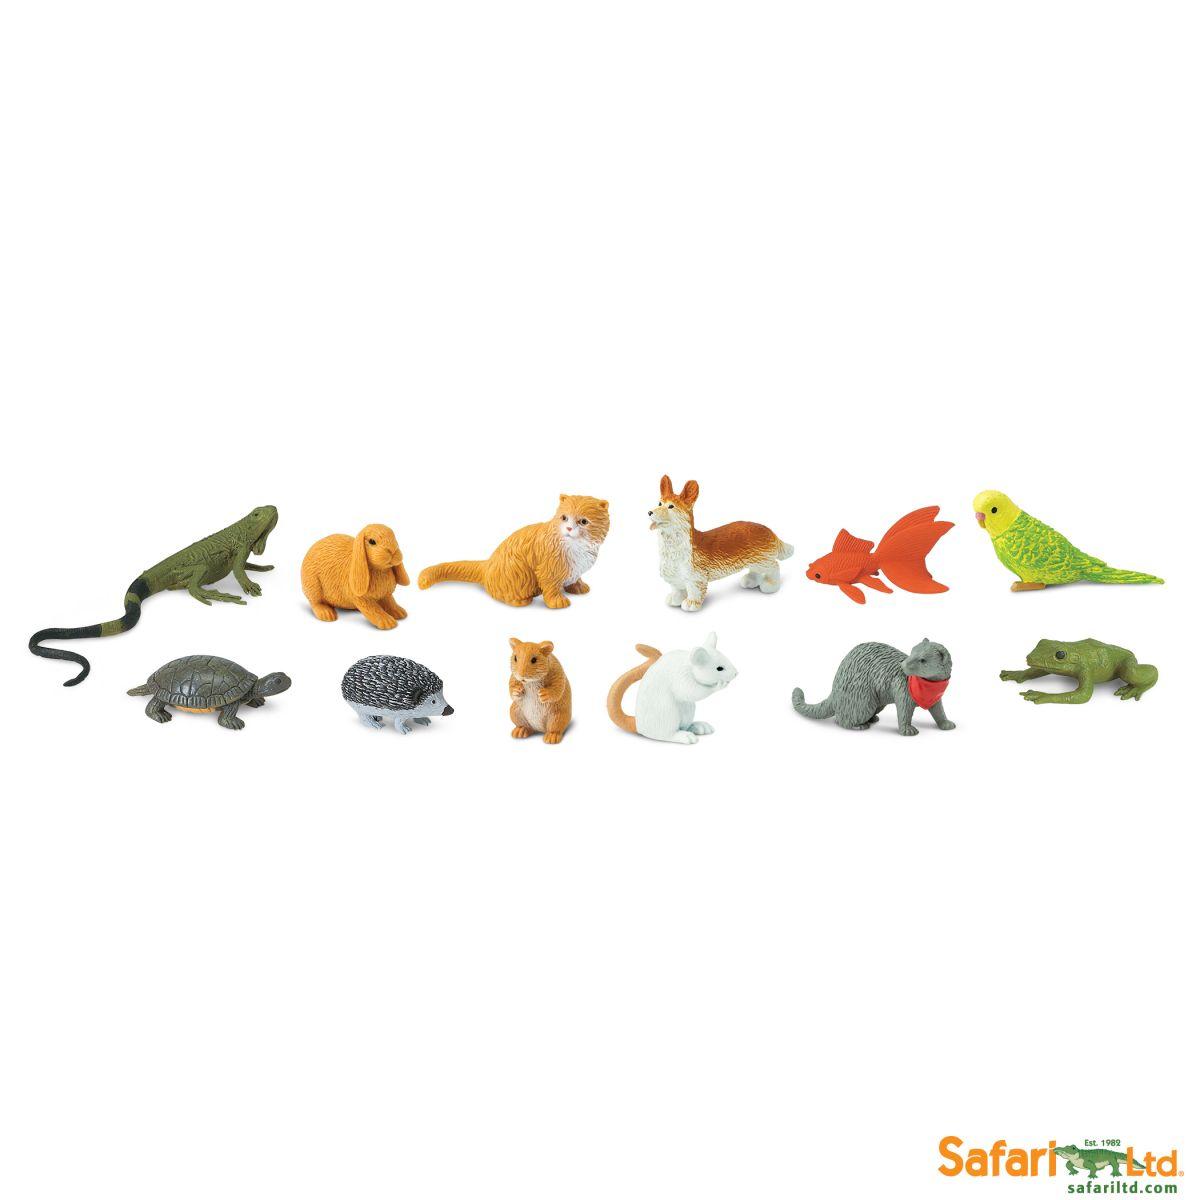 Safari Ltd. Tuba Domáce zvieratá